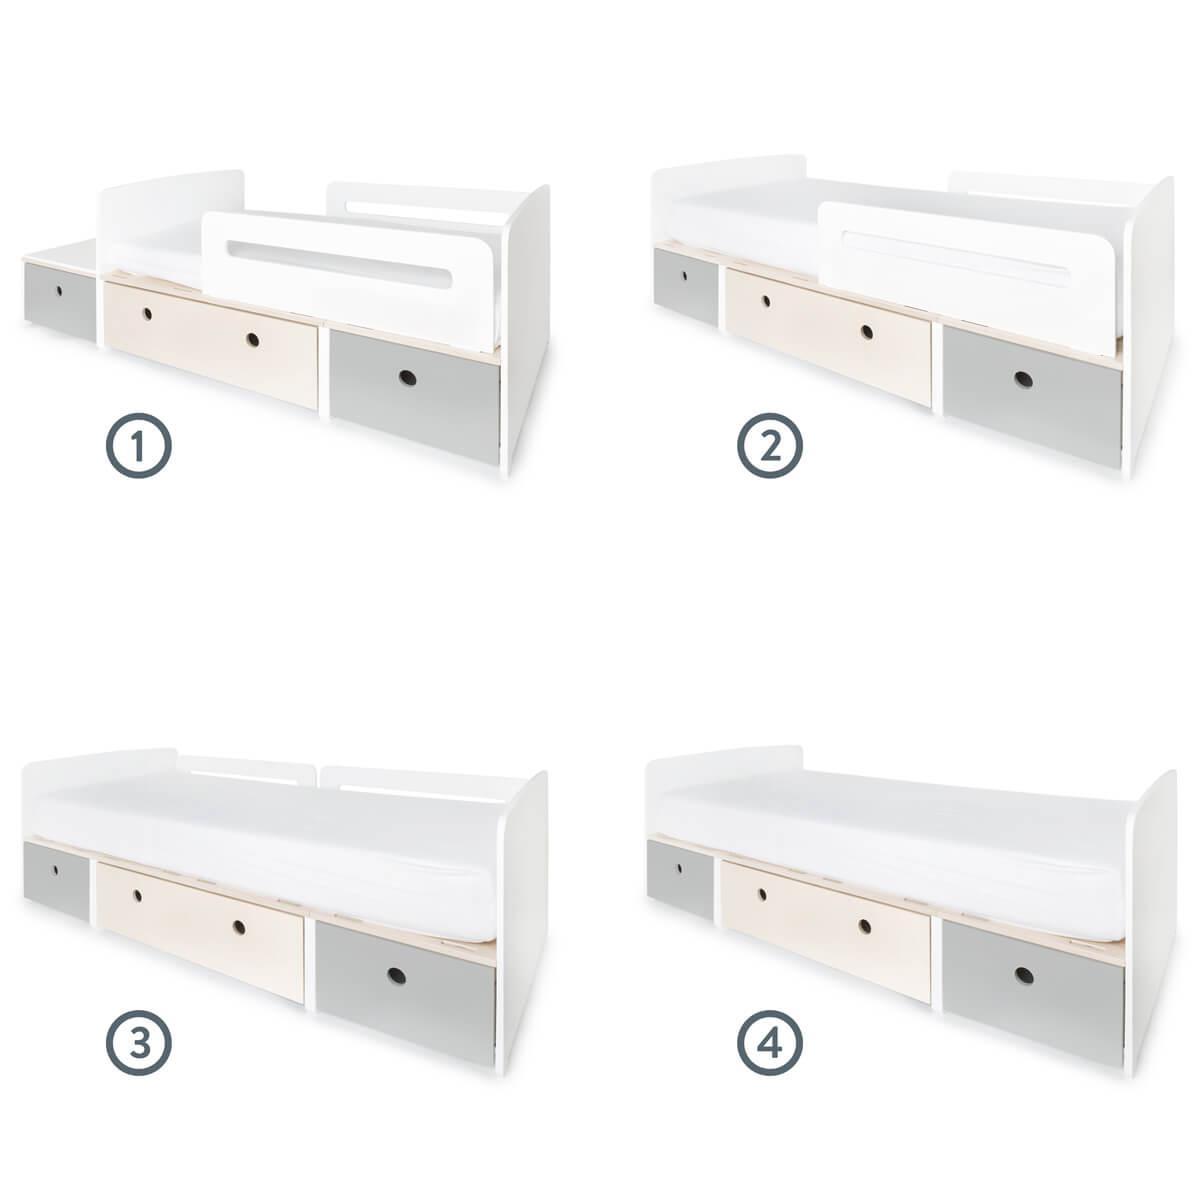 Juniorbett mitwachsend 90x150/200cm COLORFLEX pearl grey-white wash-pearl grey